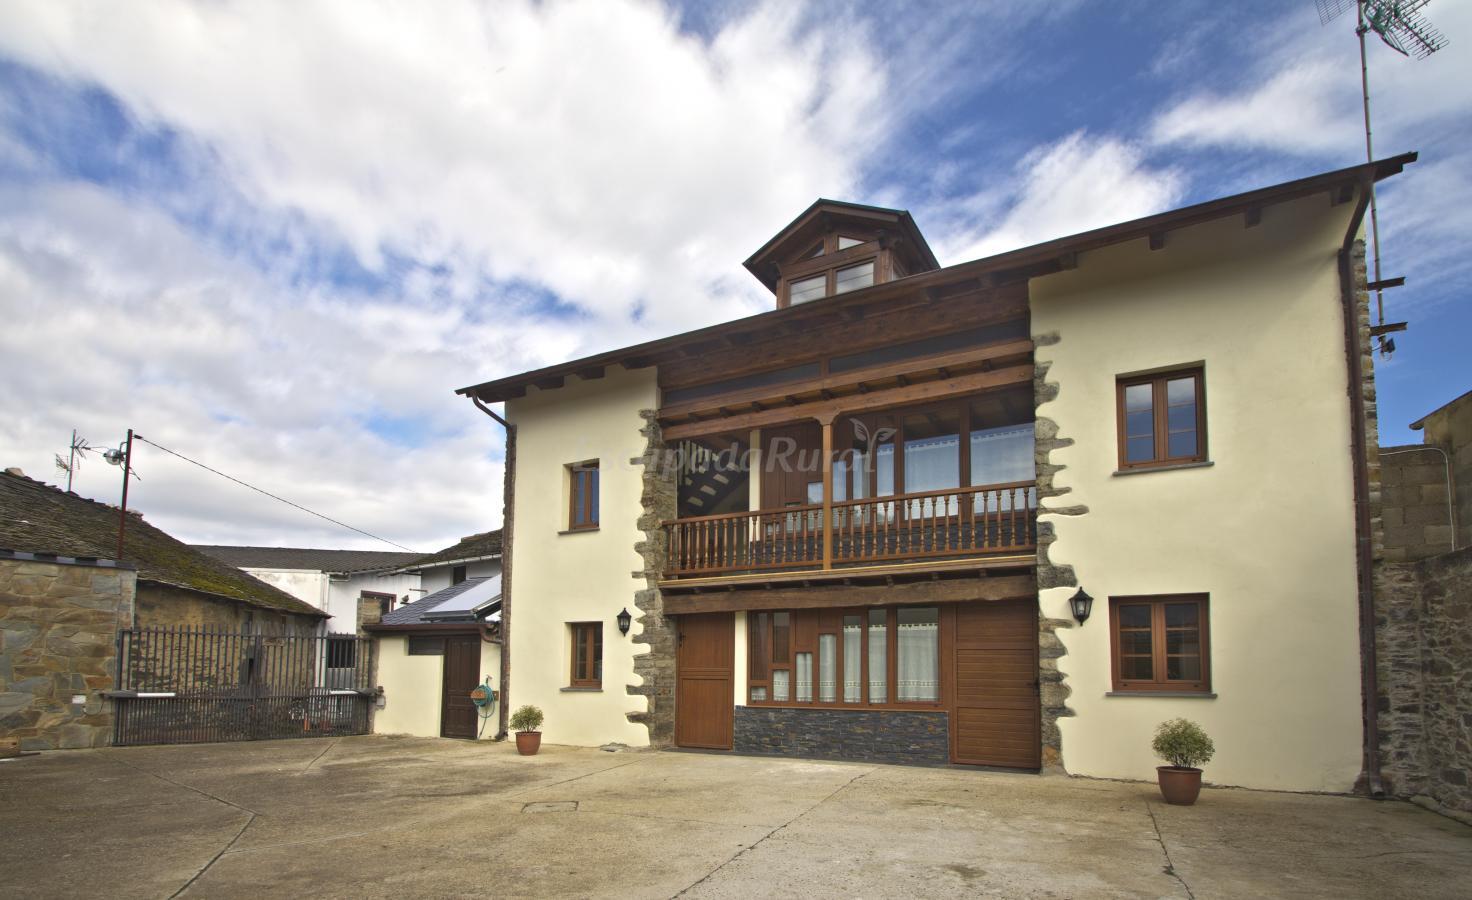 Fotos de caxila apartamentos rurales casa rural en - Casa rural luarca ...